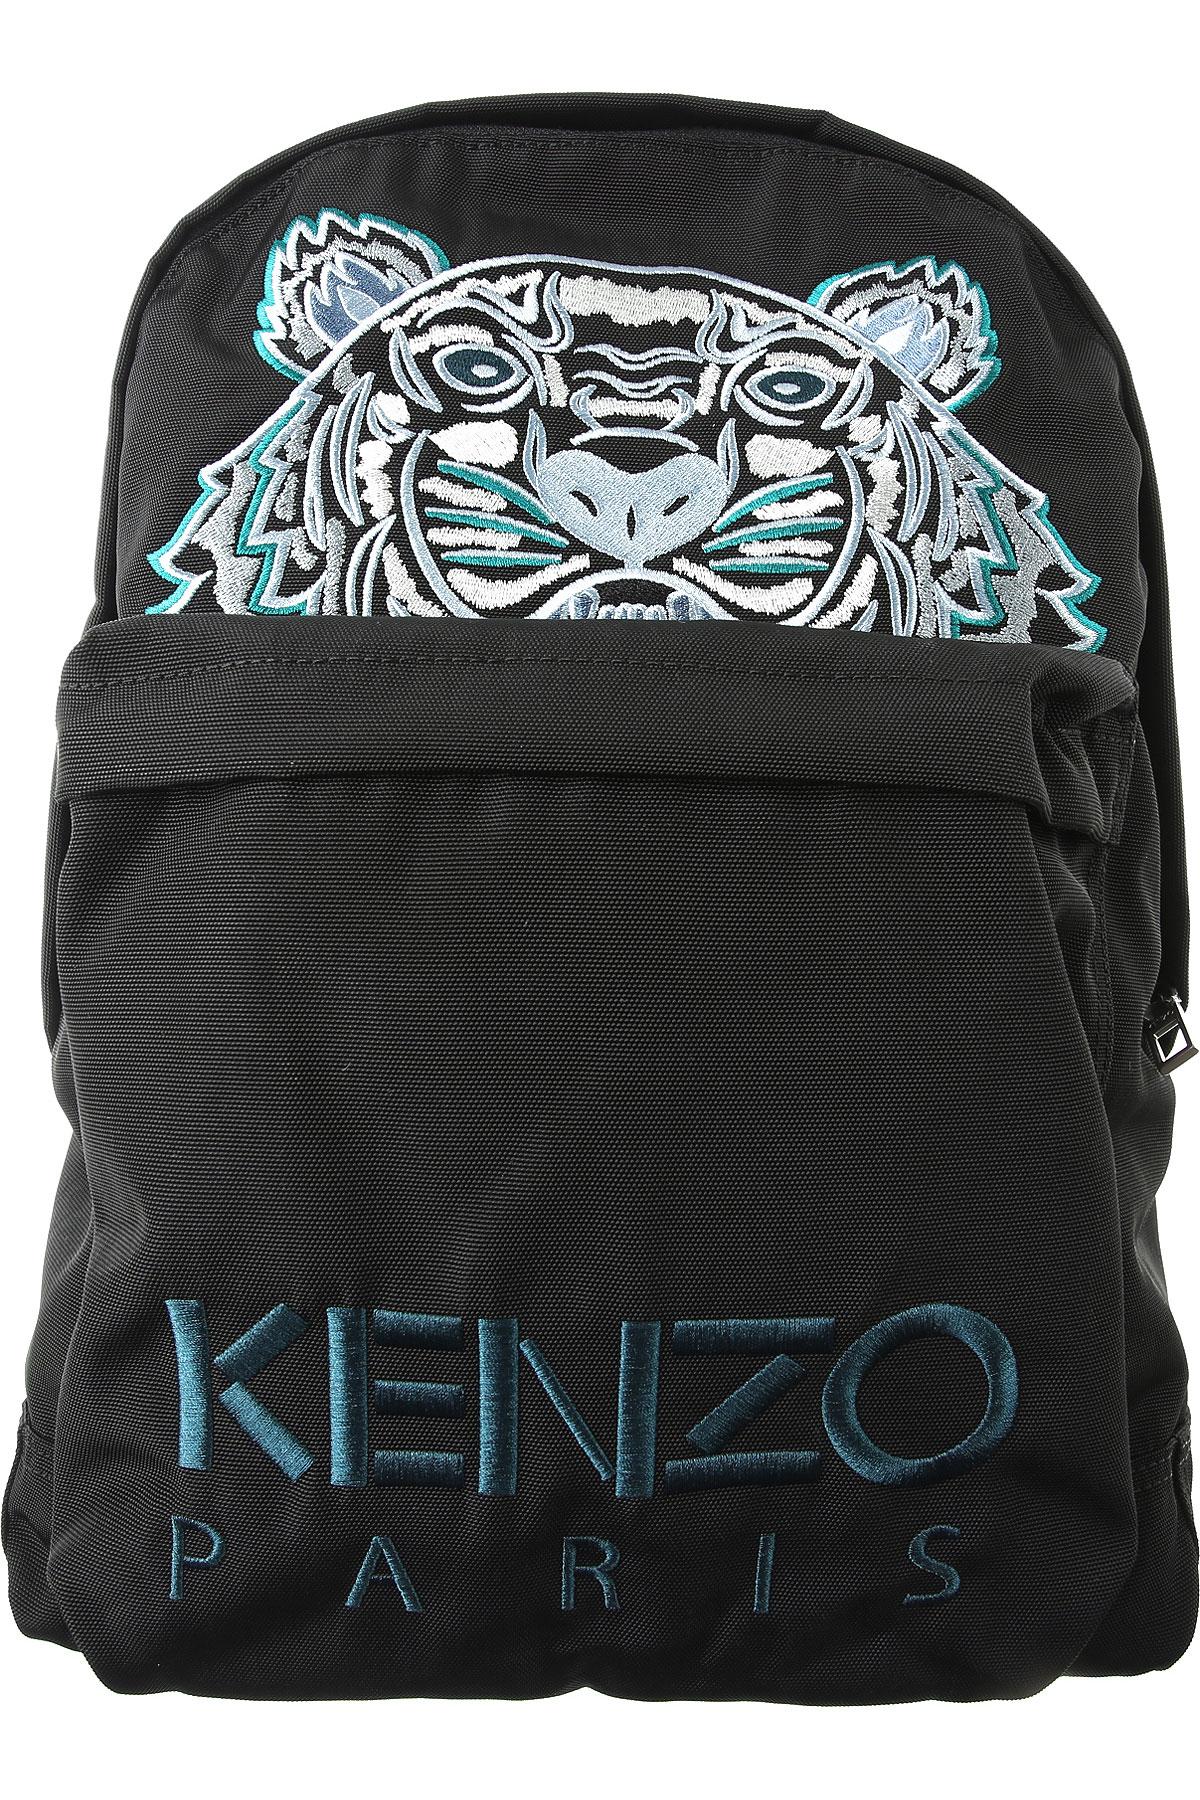 Kenzo Backpack for Men On Sale, Black, Fabric, 2019